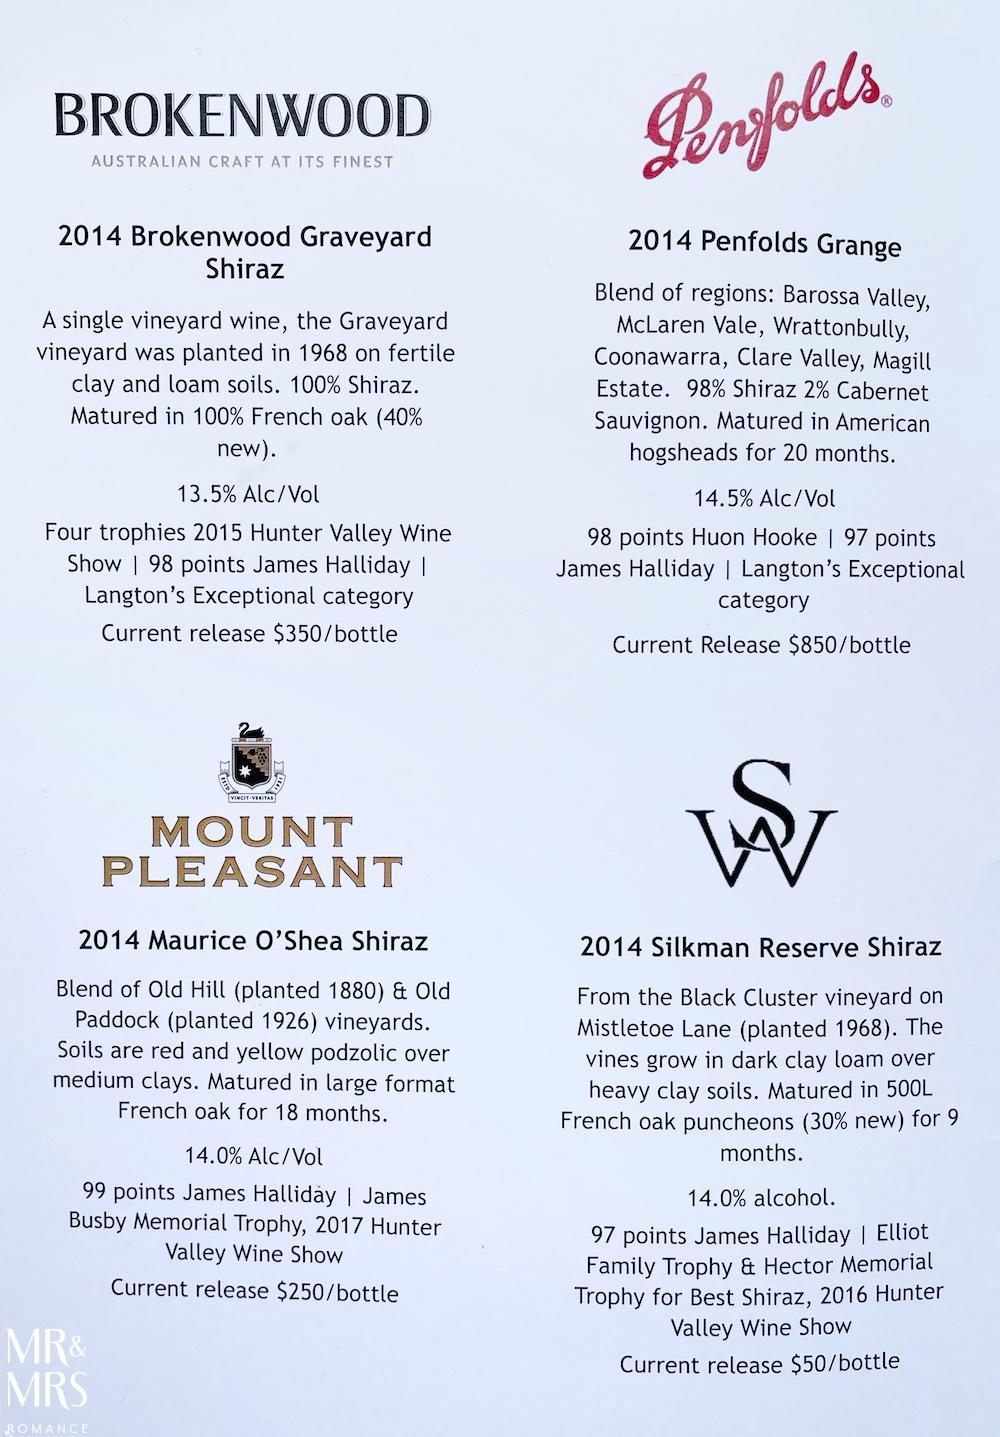 Penfolds Grange, Brokenwood Graveyard Shiraz, Mount Pleasant Maurice O'Shea, Silkman Reserve, Hunter Valley wine